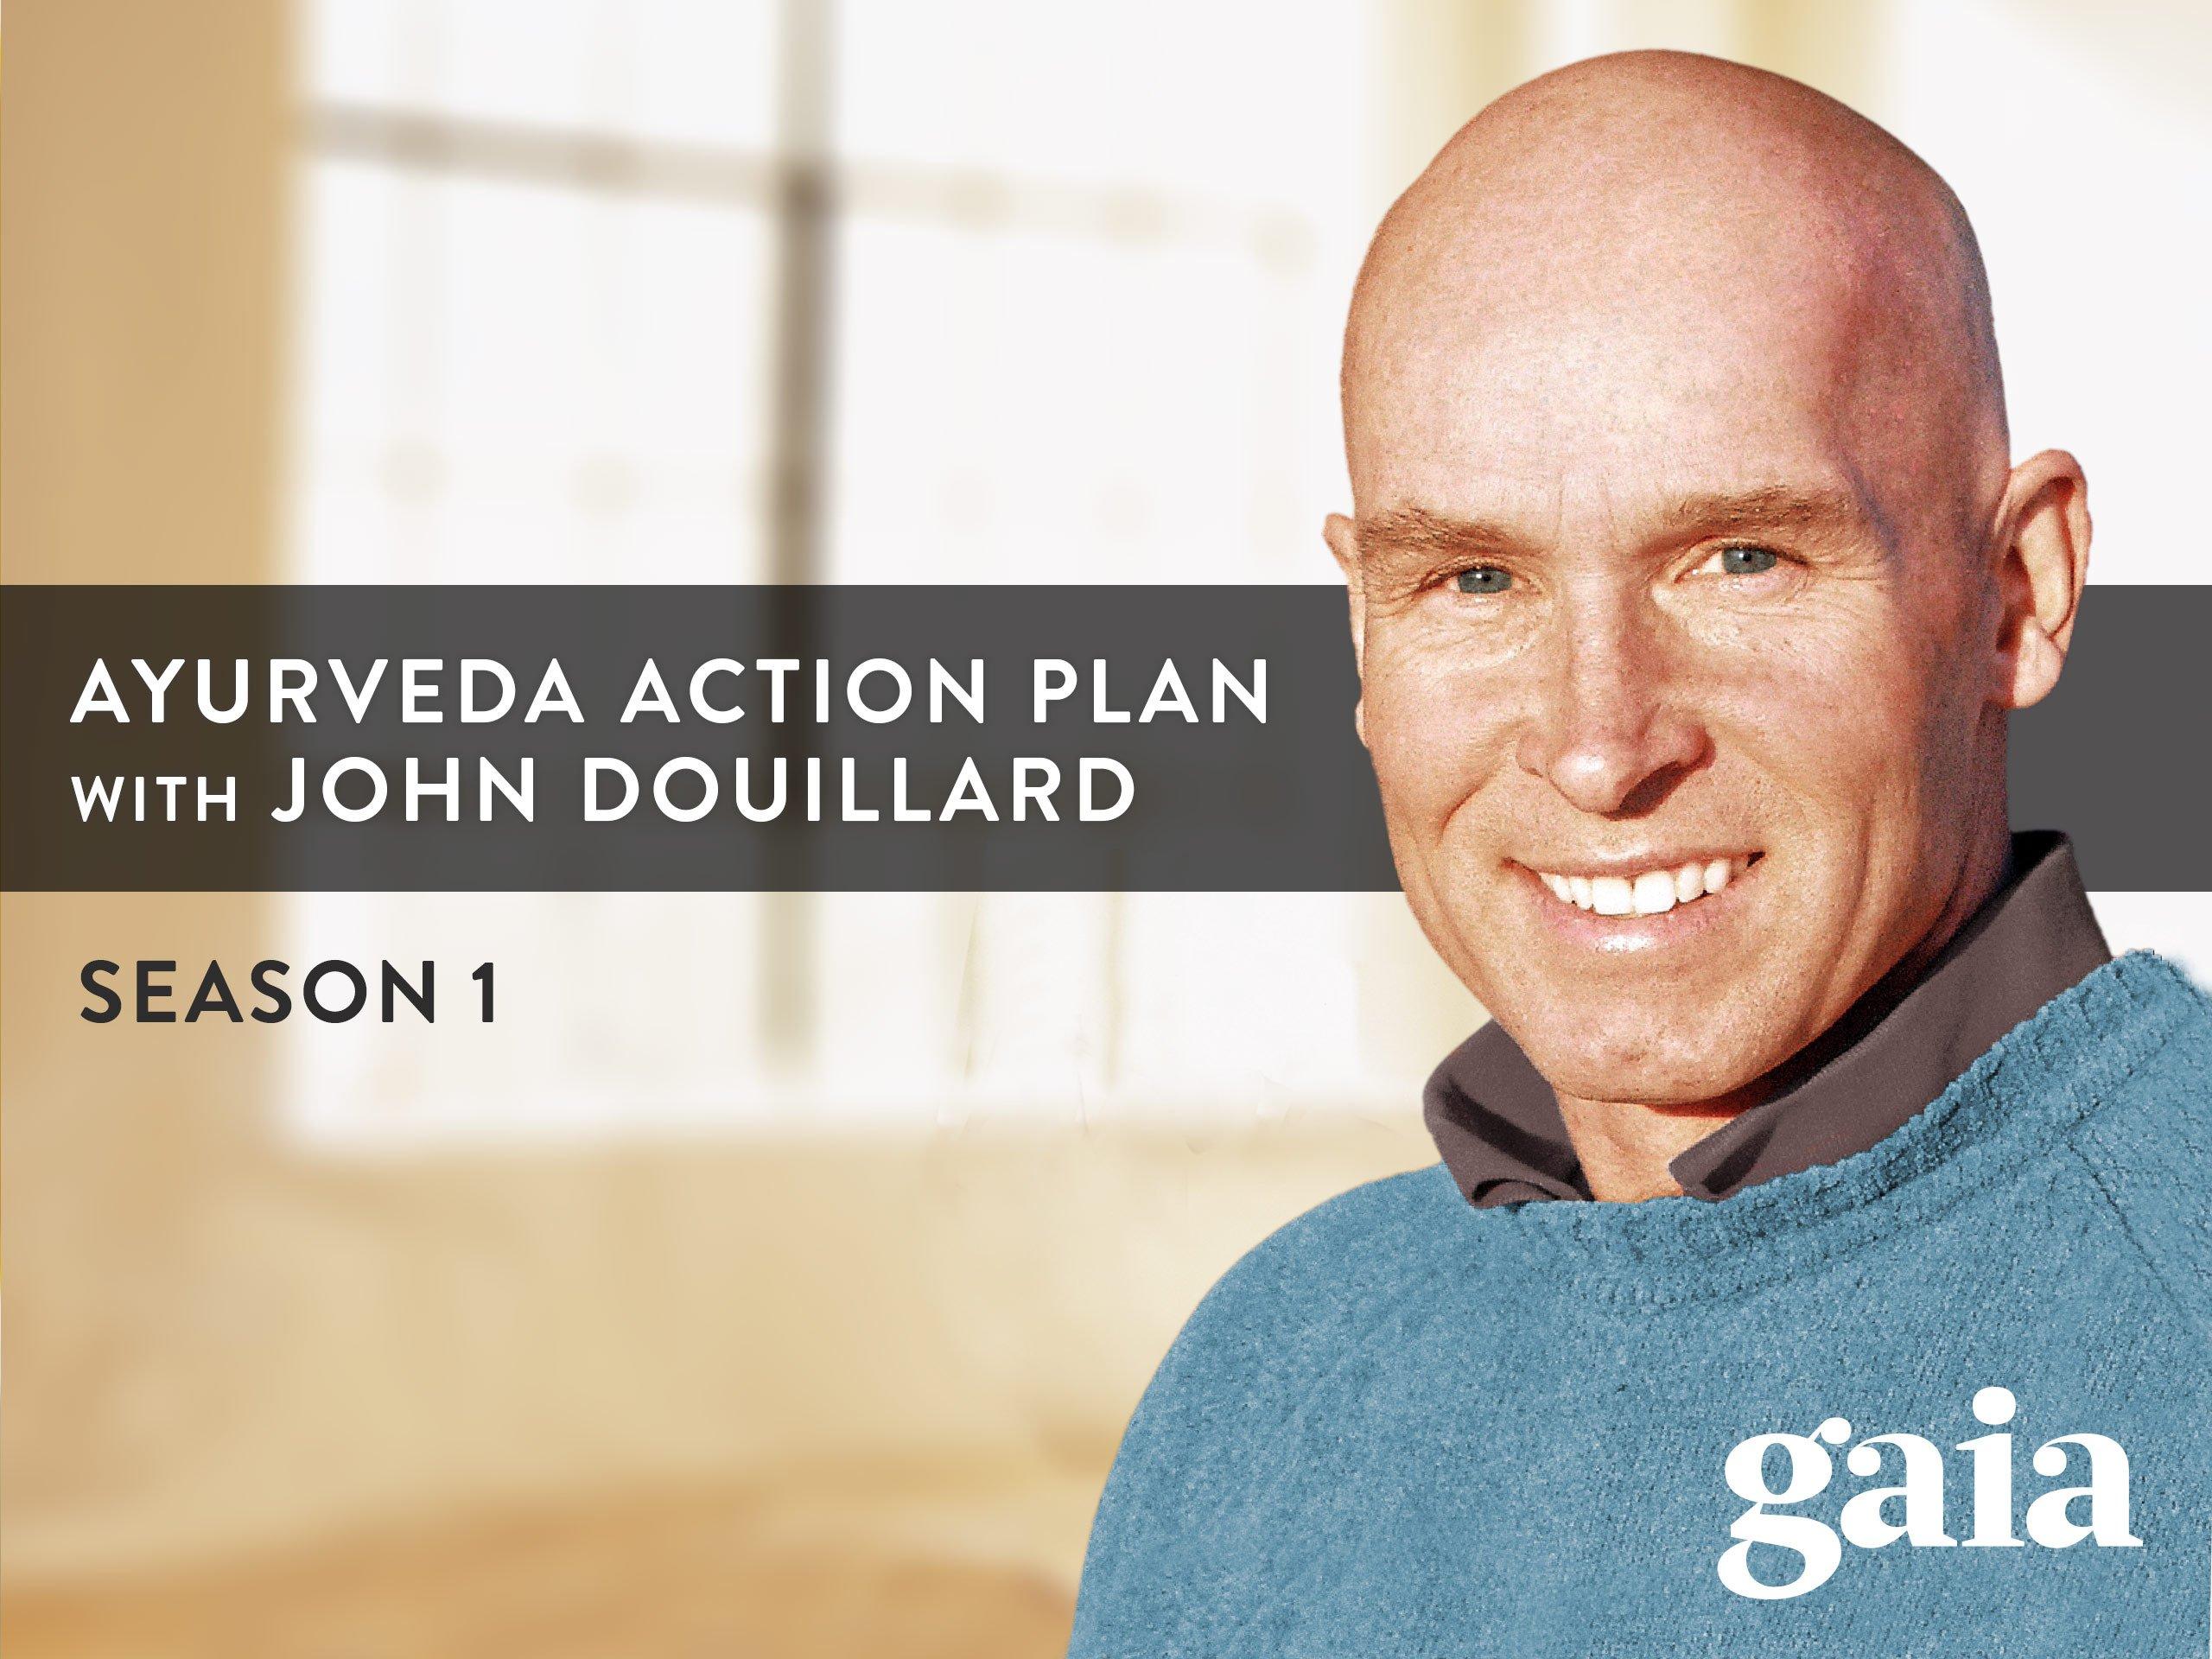 Amazon.com: Watch Ayurveda Action Plan - Season 1 | Prime Video